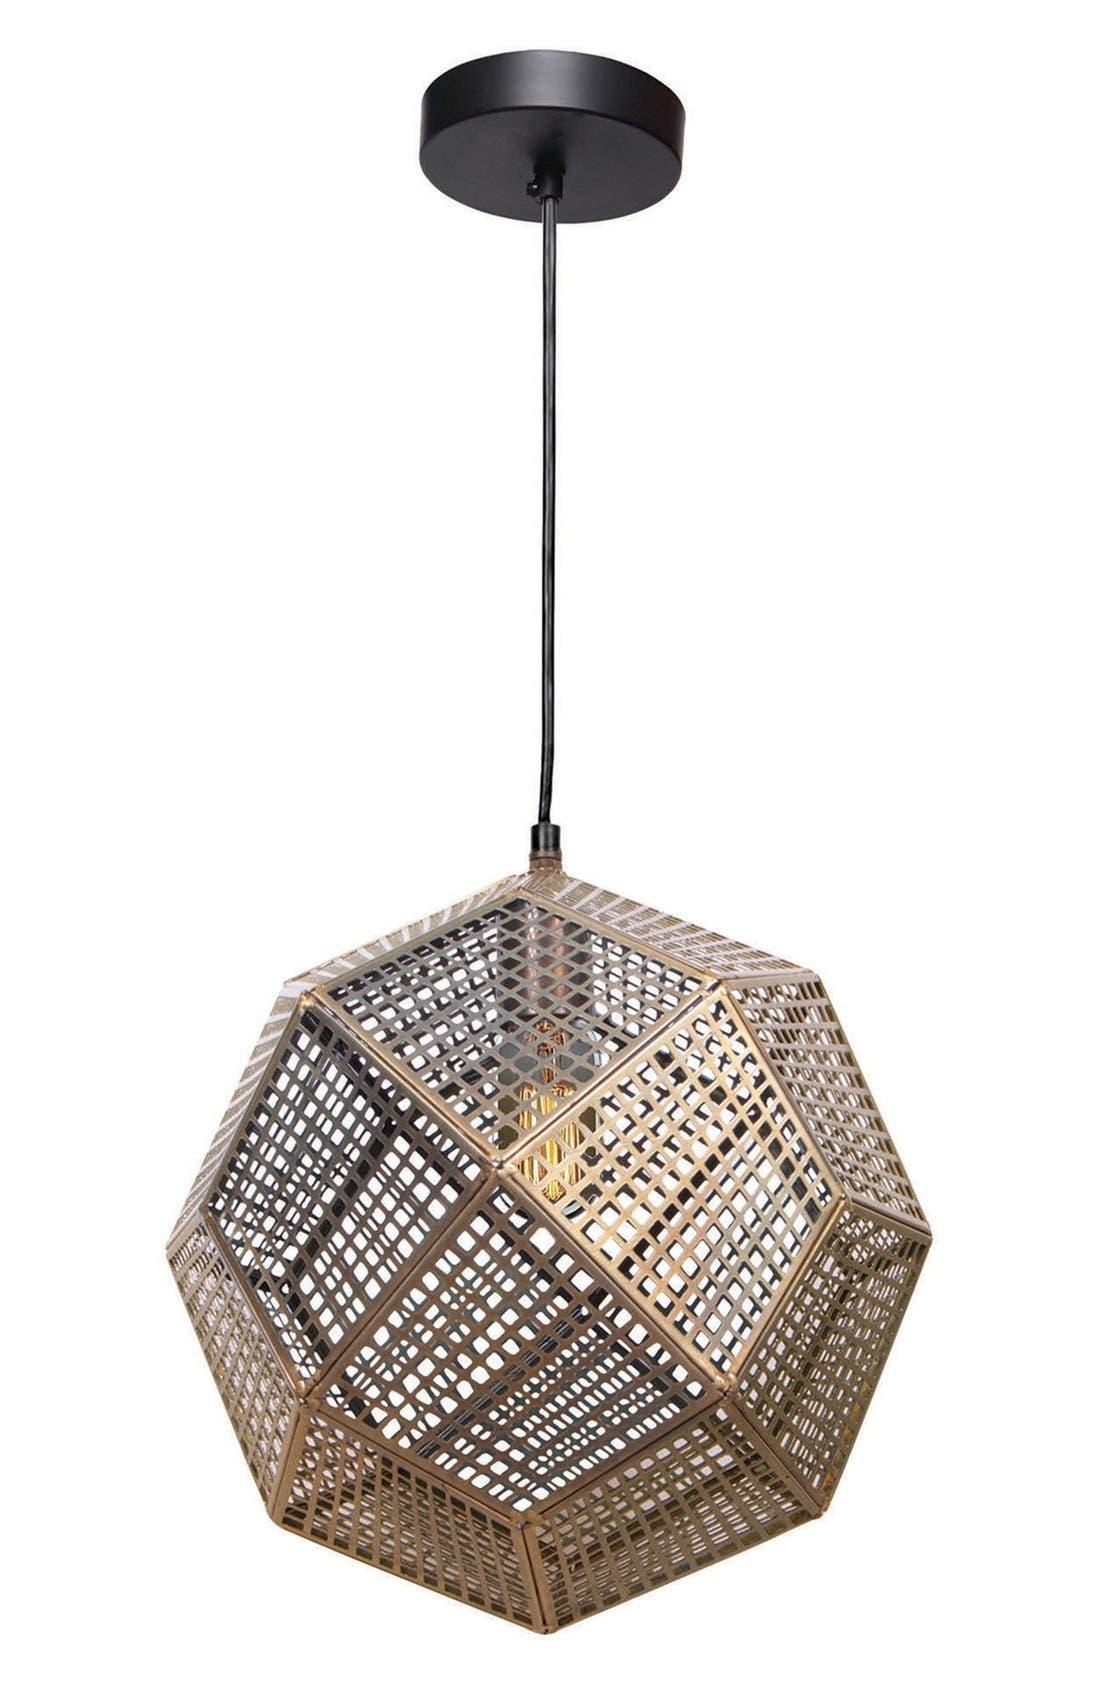 'Skars' Ceiling Light Fixture,                         Main,                         color, 220